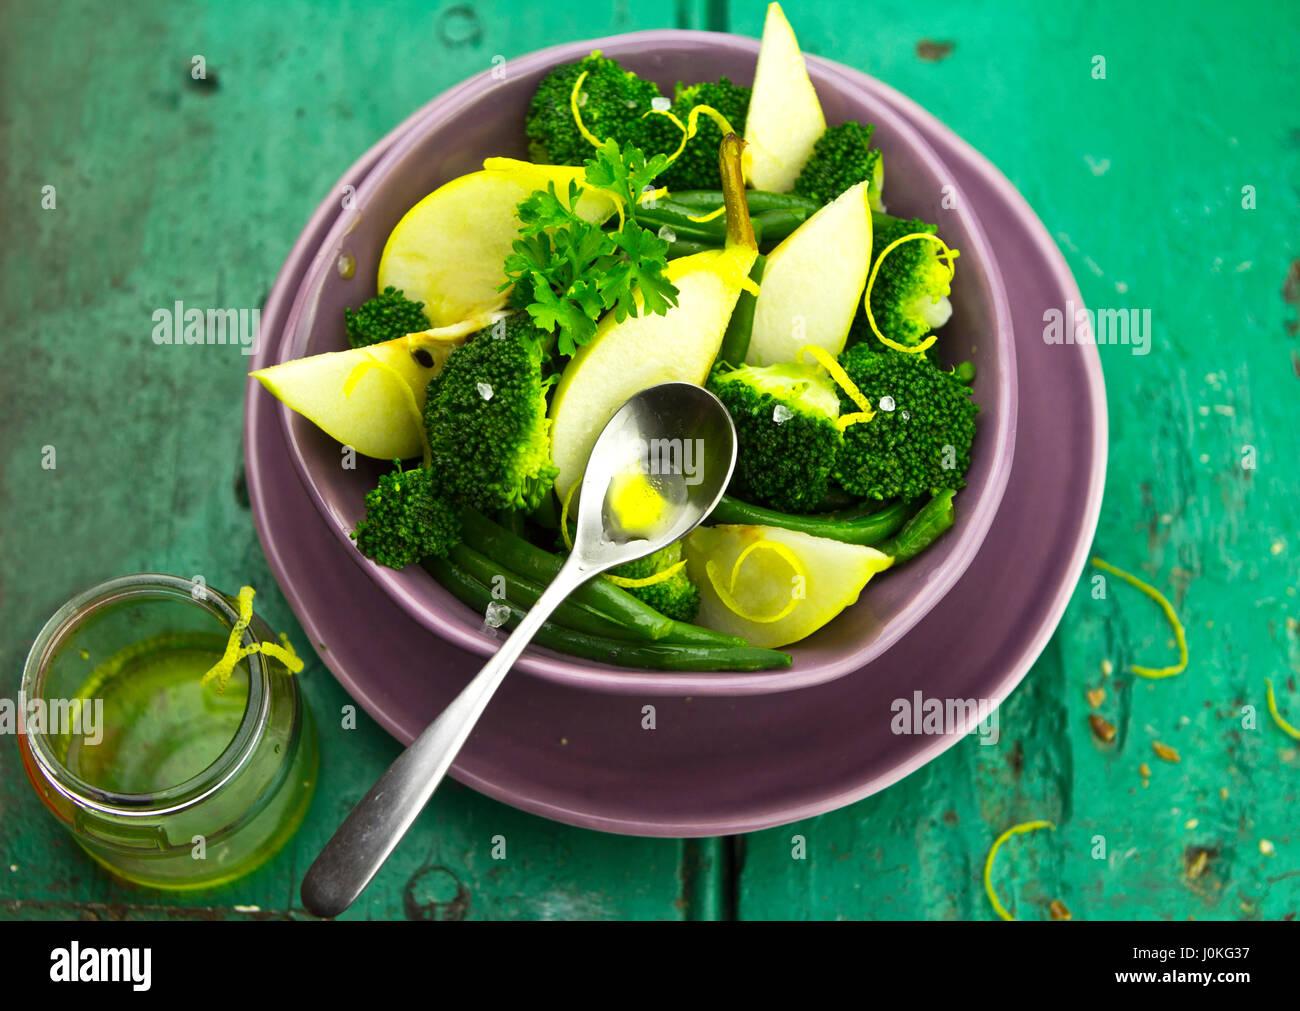 Pera, brócoli, habas verdes ensalada con pan moreno Imagen De Stock